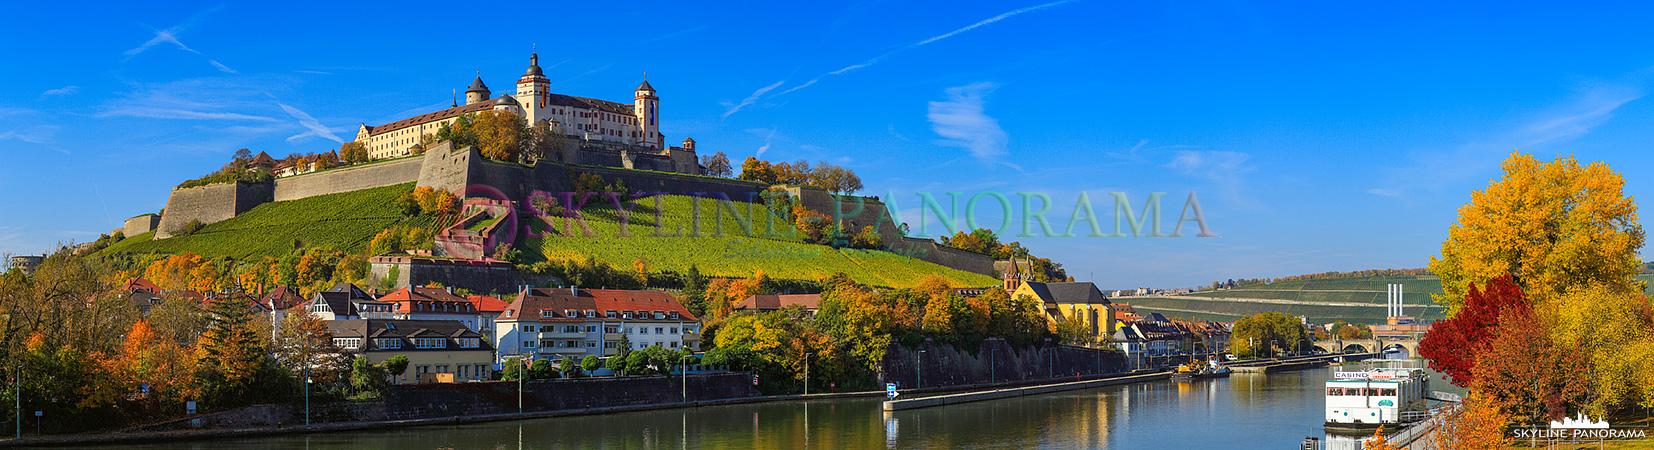 Fotos De Skyline >> Panorama Würzburg - Bayern (p_00648) - skyline-panorama.de